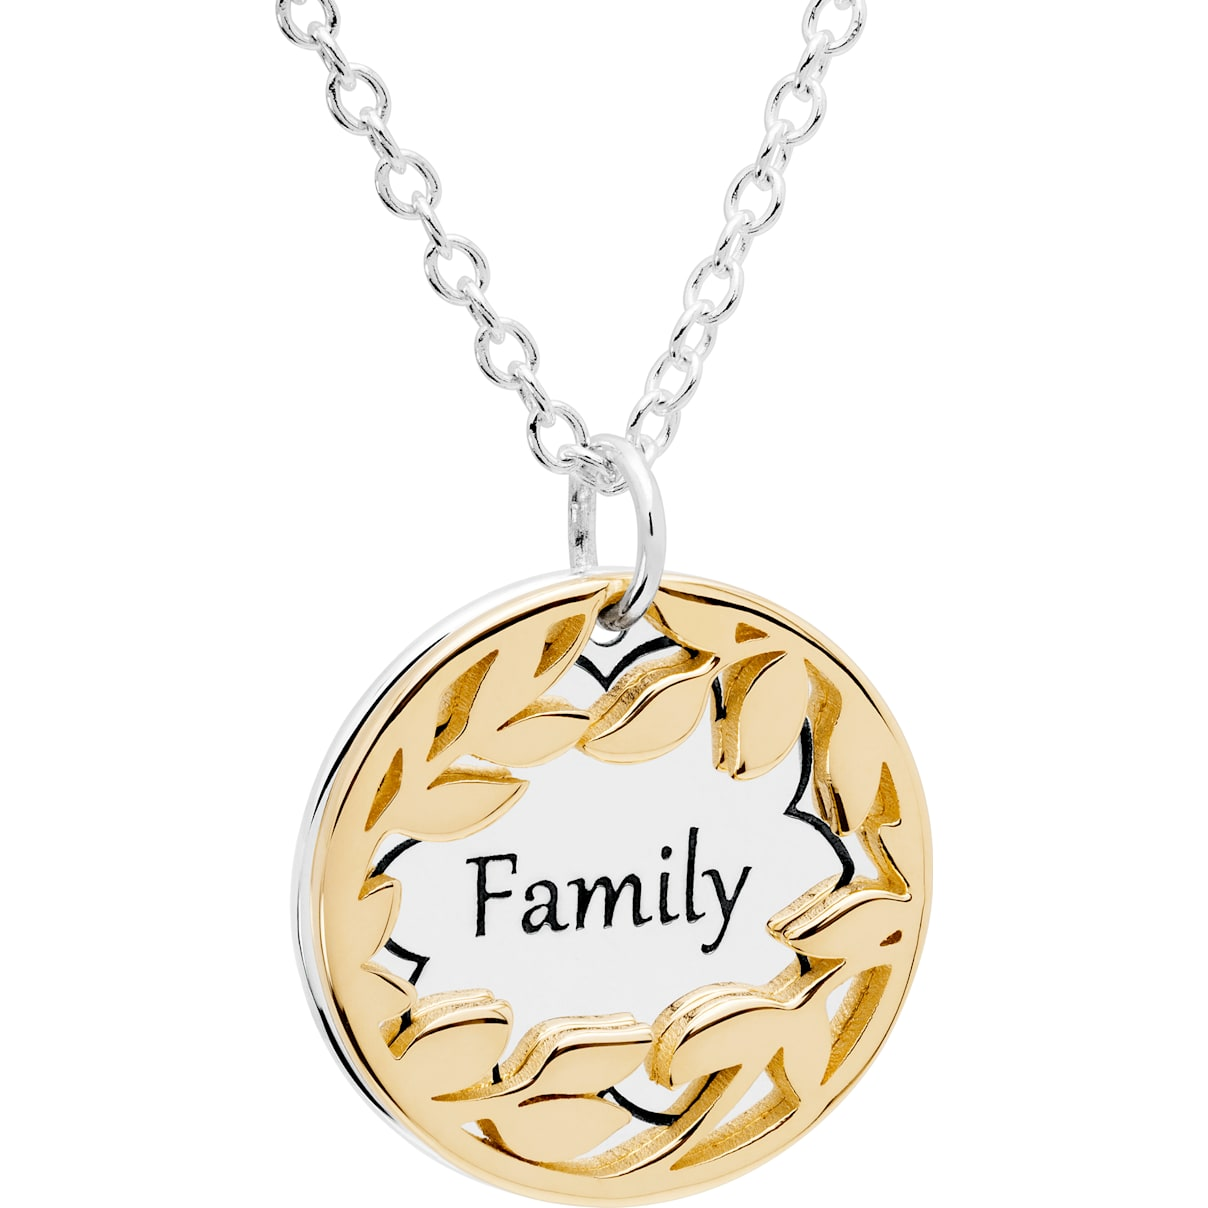 Swarovski Treasure Necklace - Family